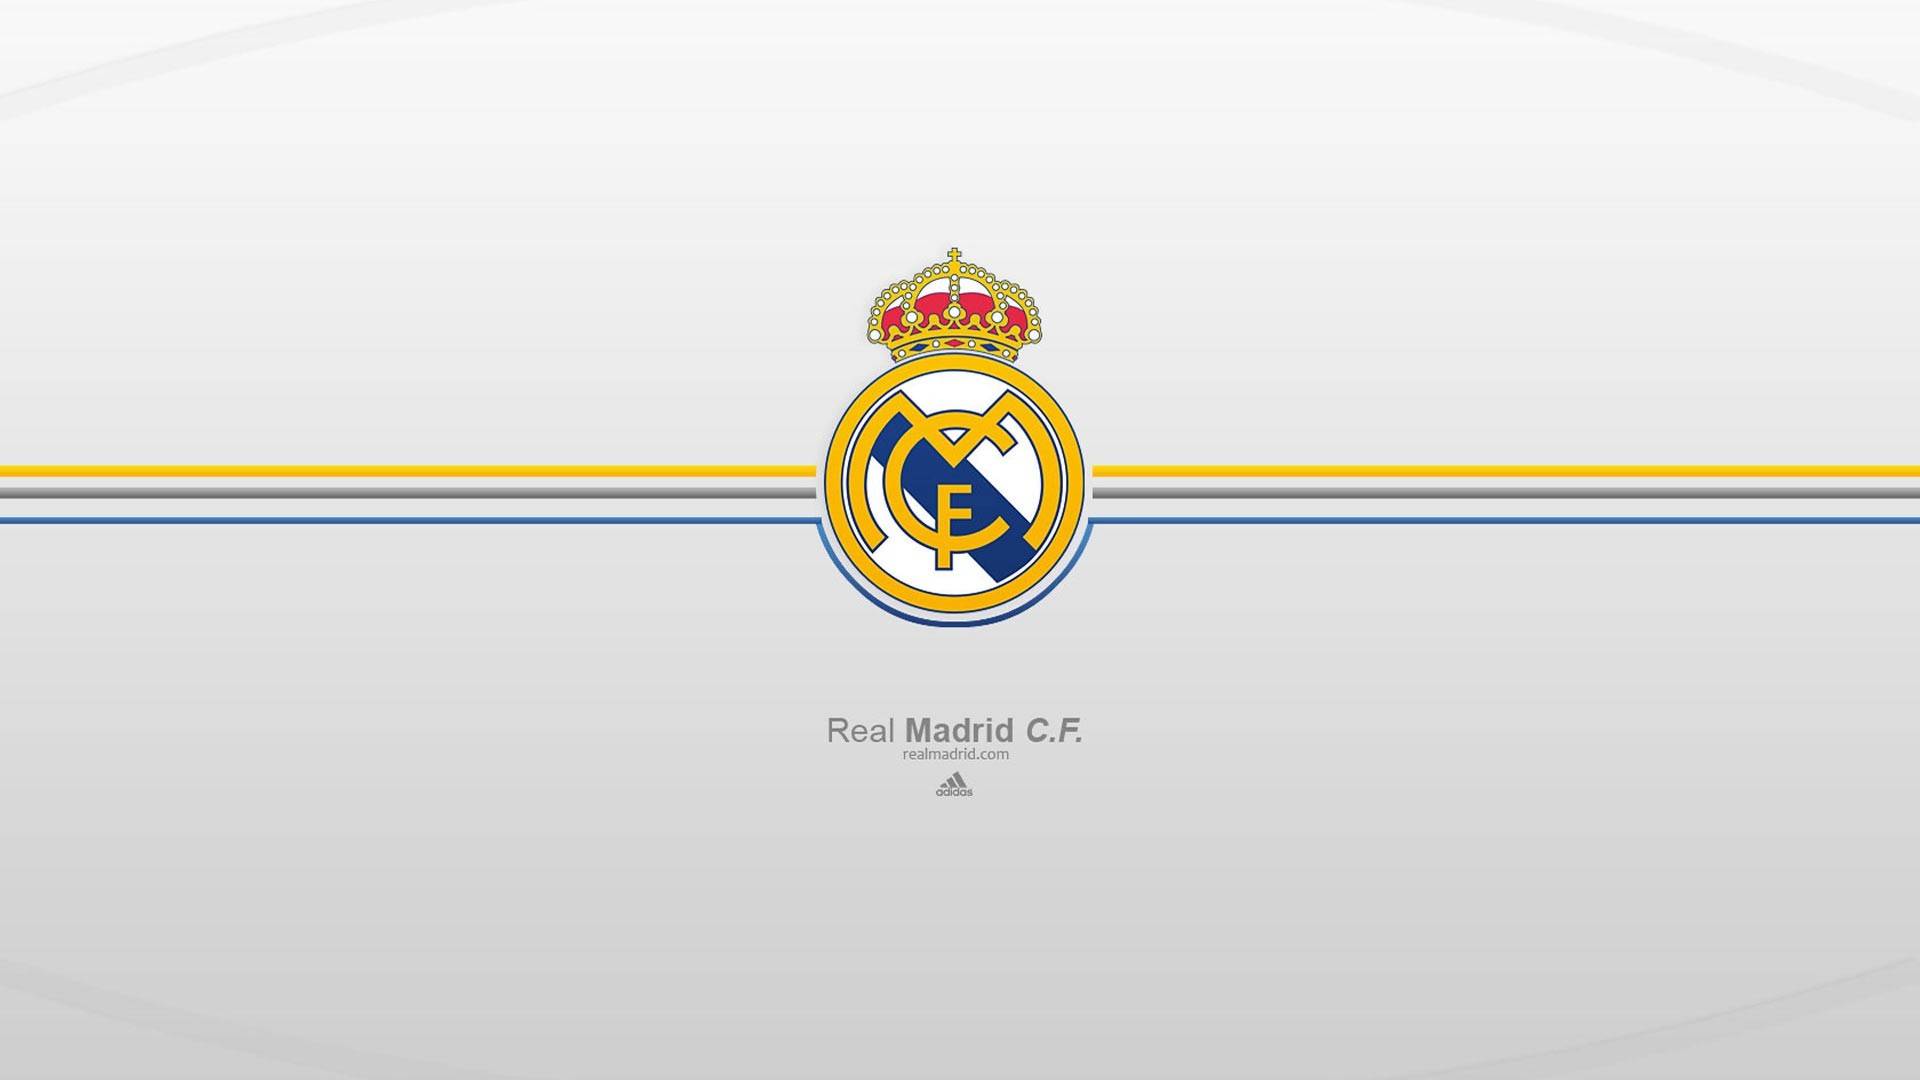 Real Madrid Logo Wallpaper HD Widescreen.